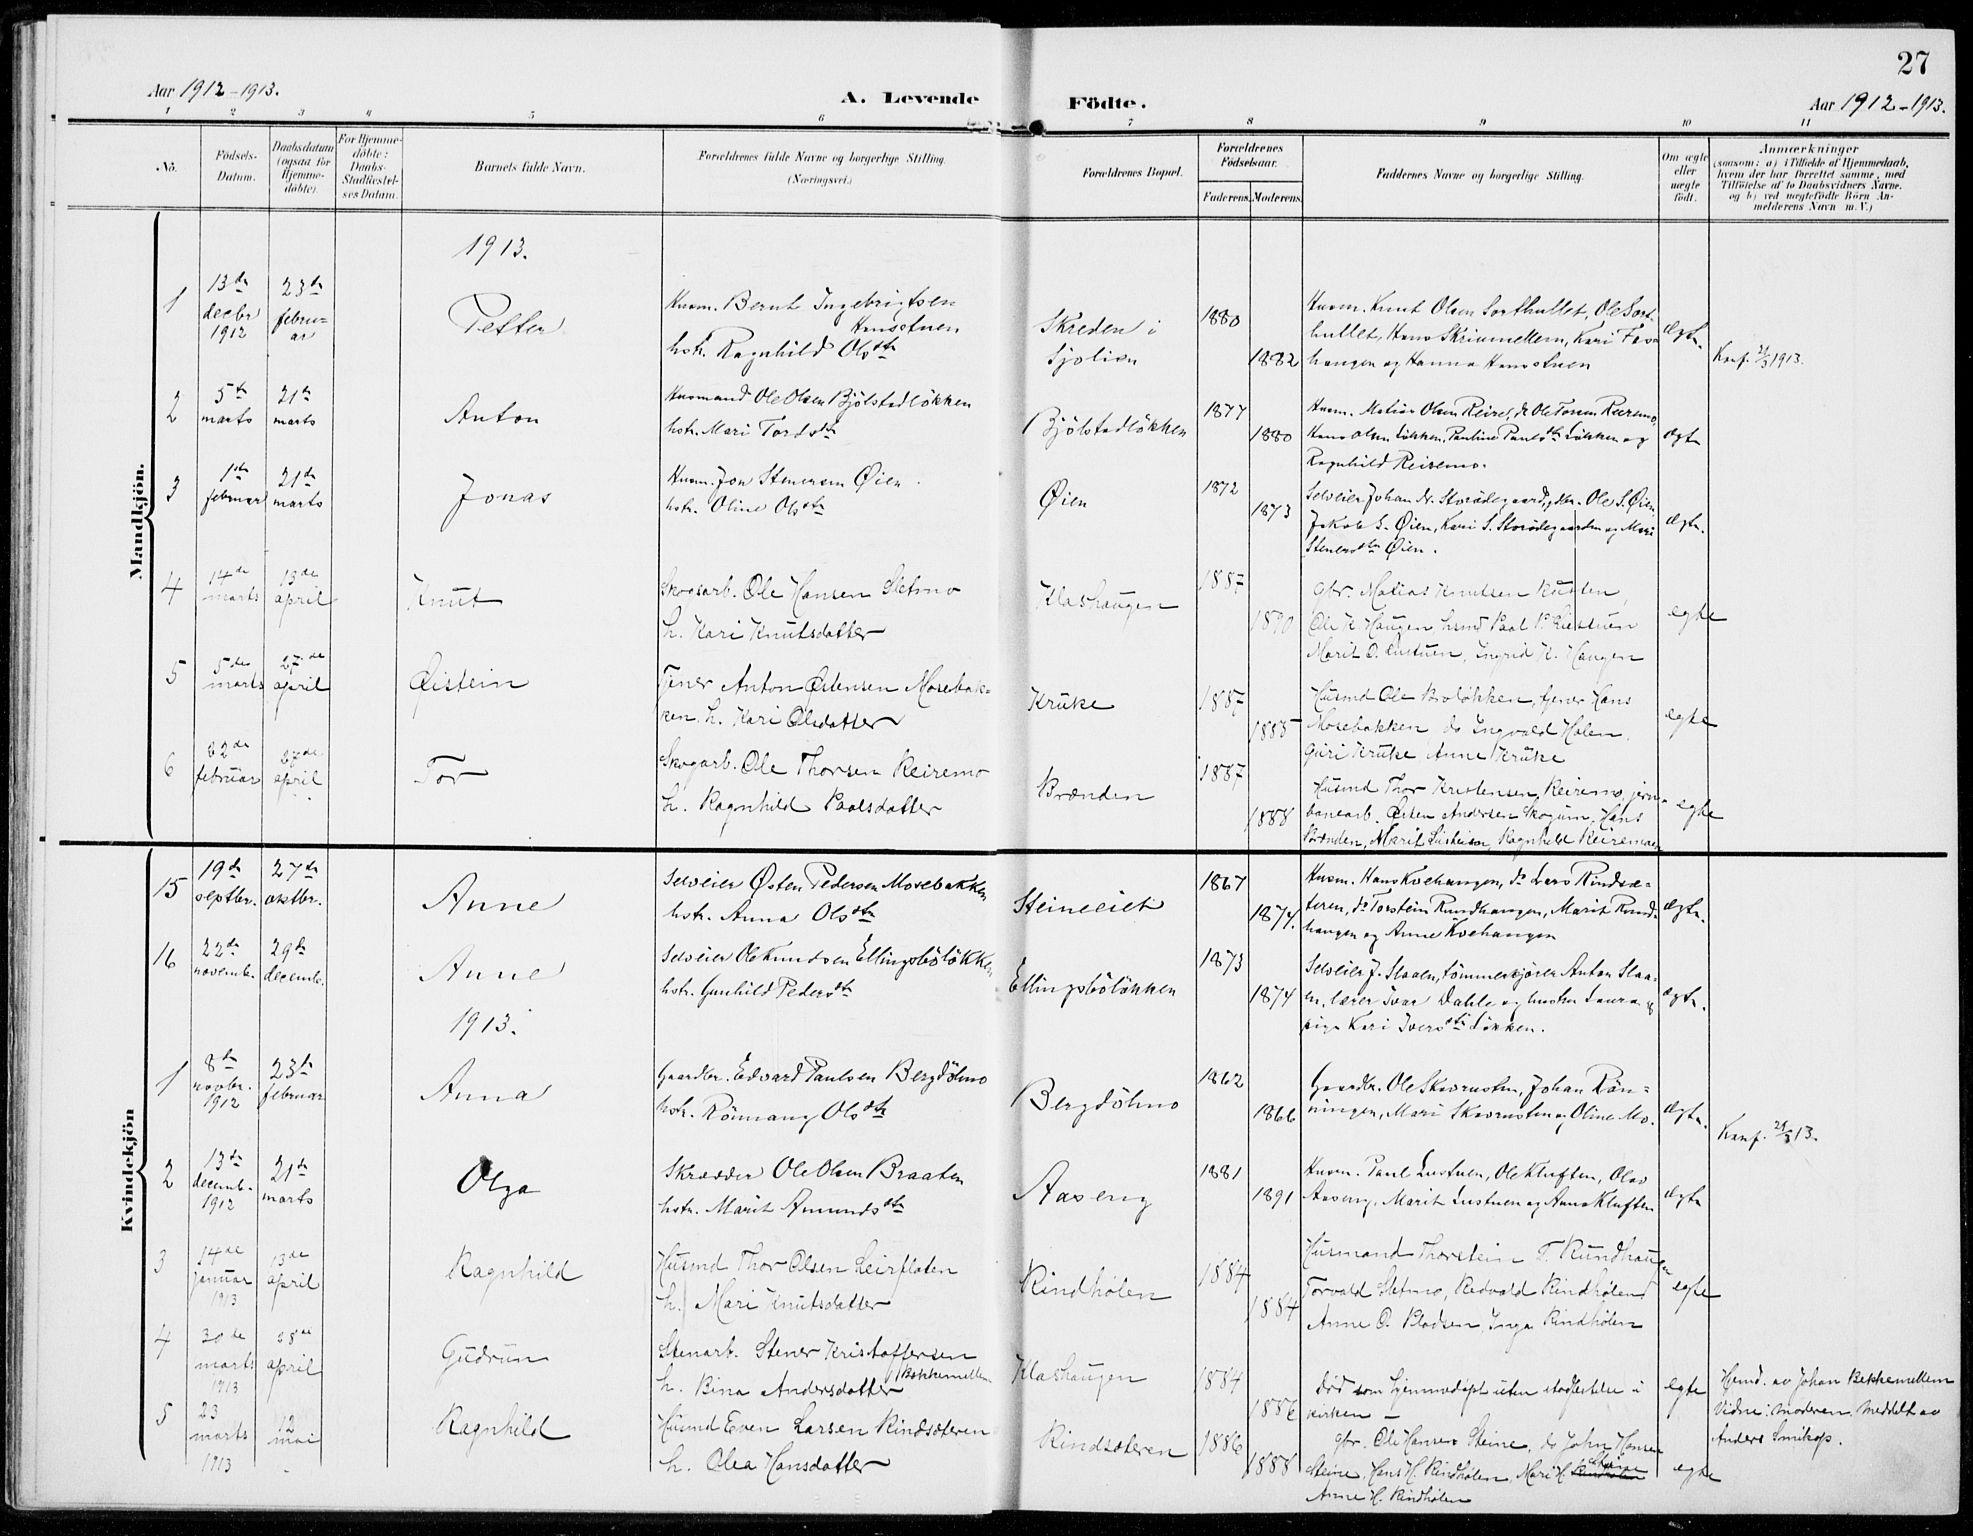 SAH, Sel prestekontor, Ministerialbok nr. 1, 1905-1922, s. 27